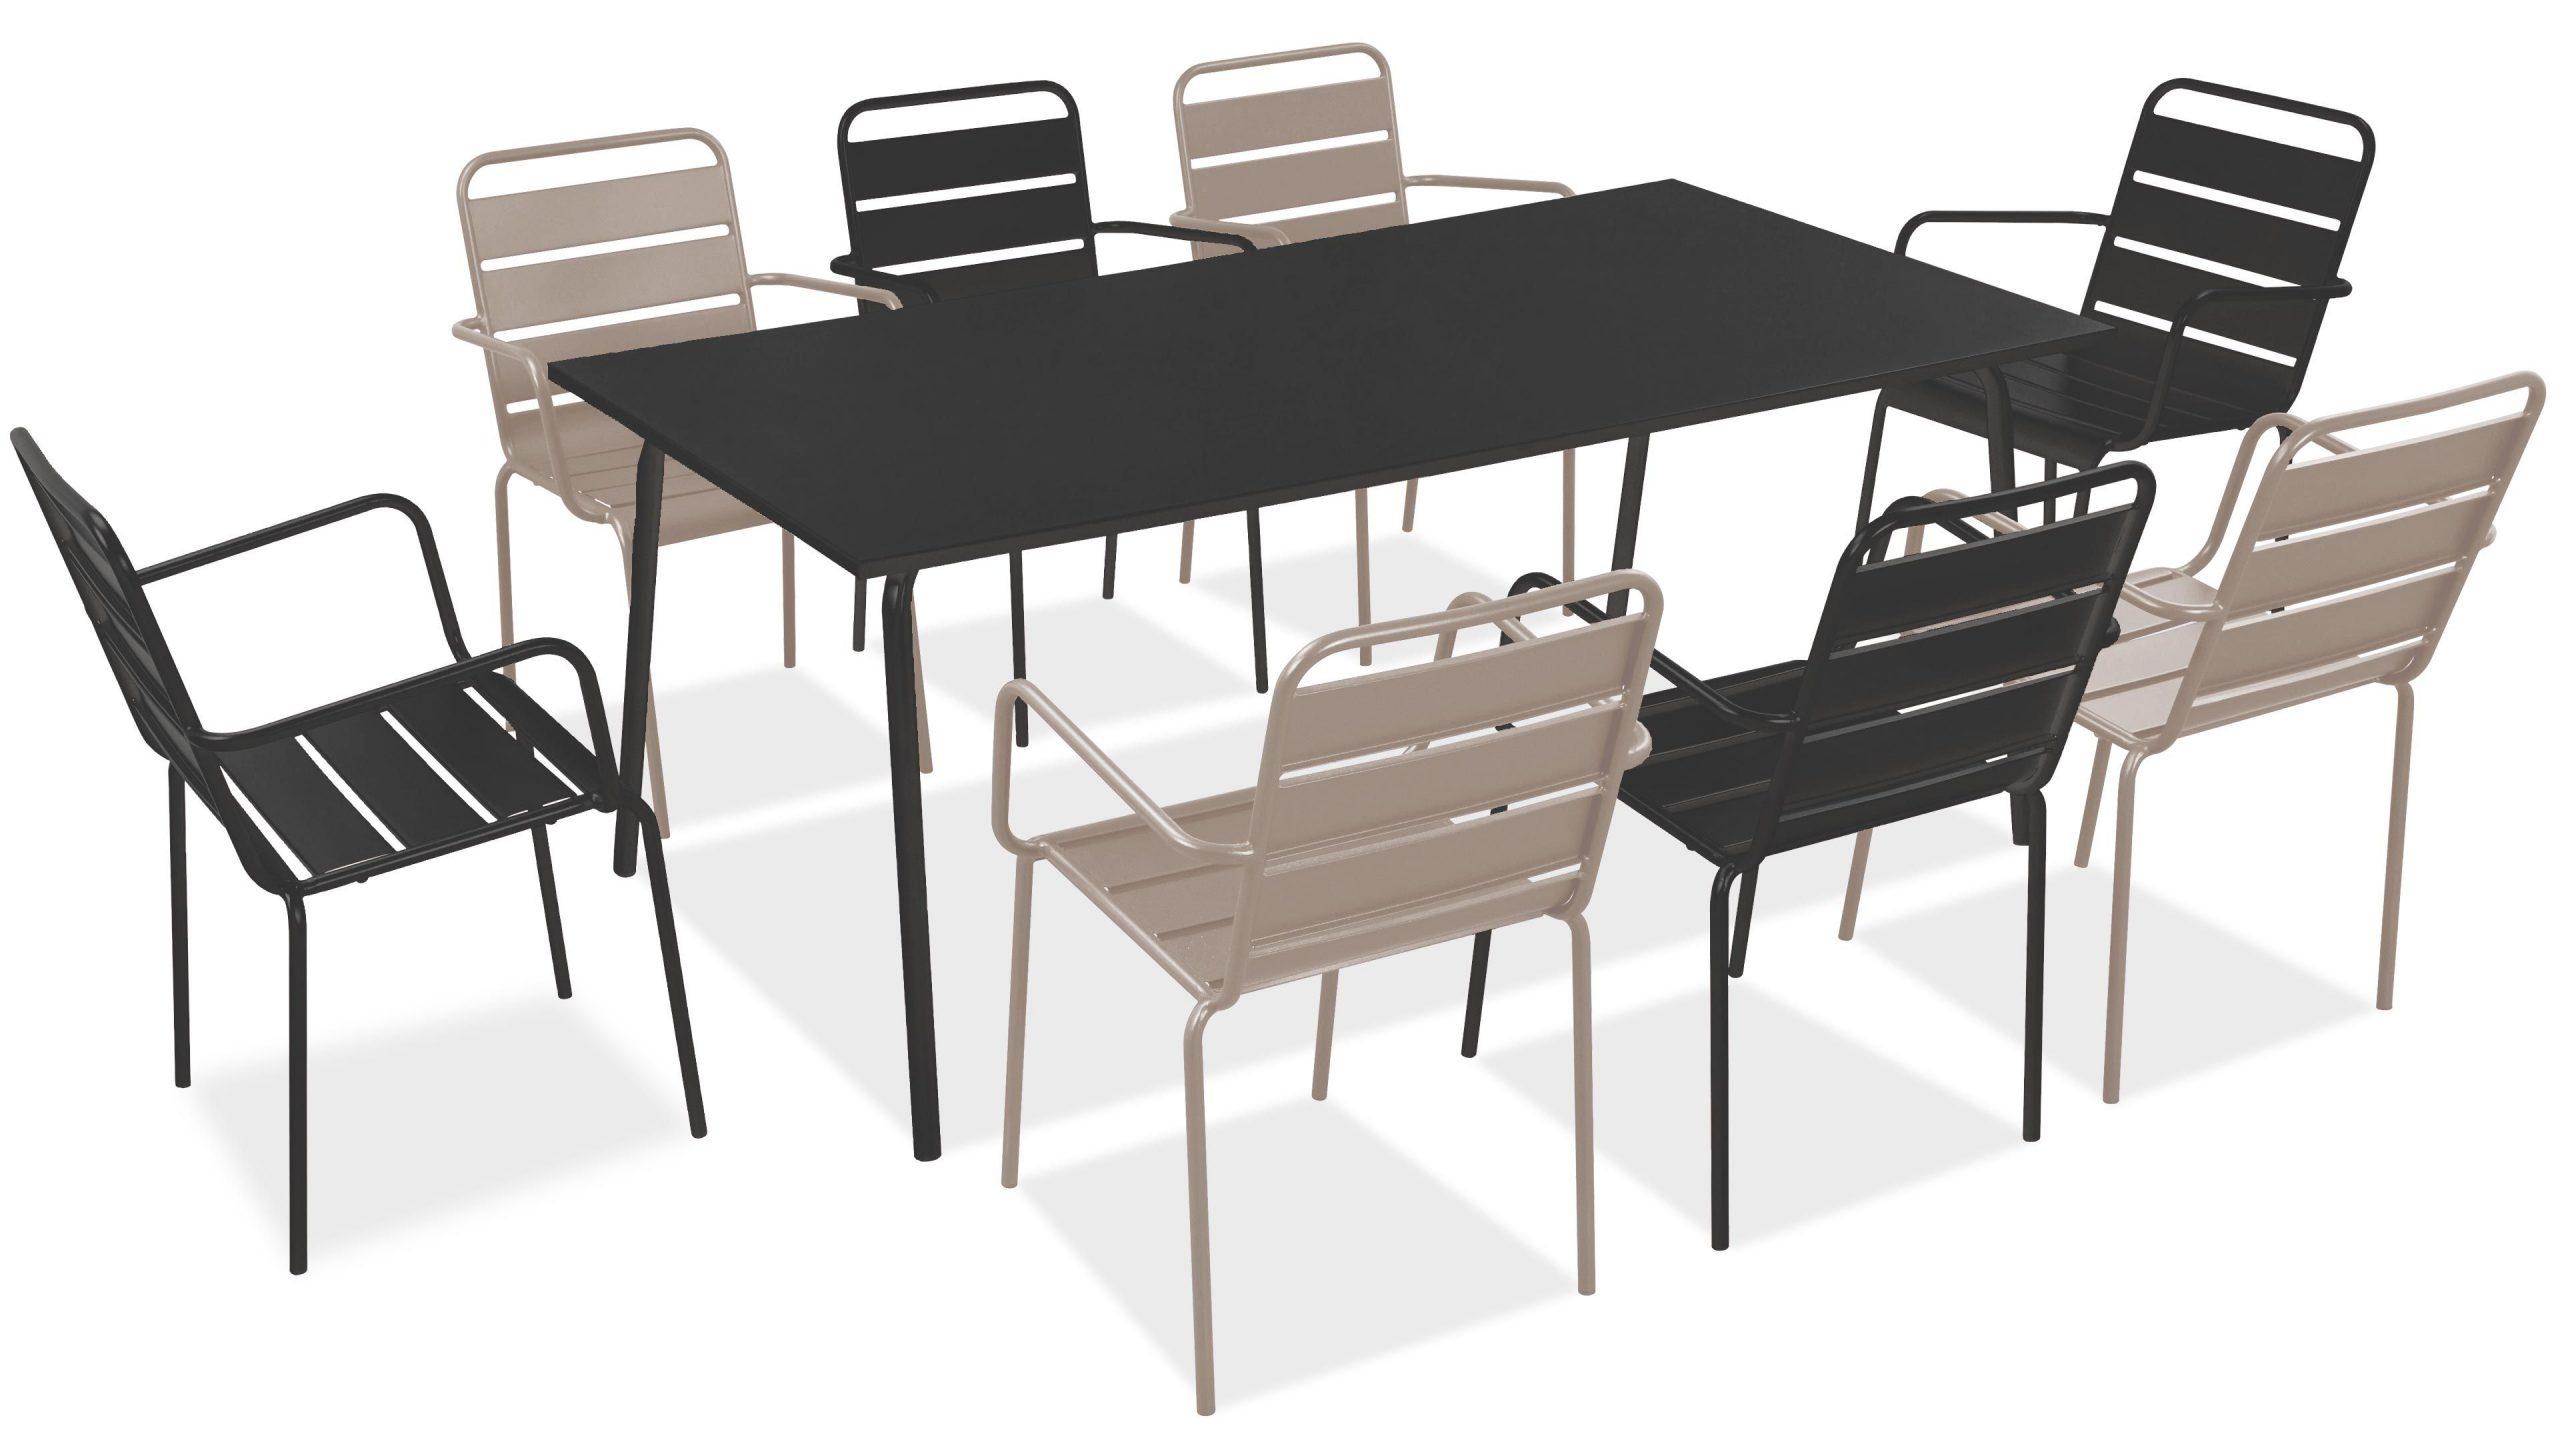 Salon De Jardin Metal Table Et Fauteuils destiné Bache Table Jardin